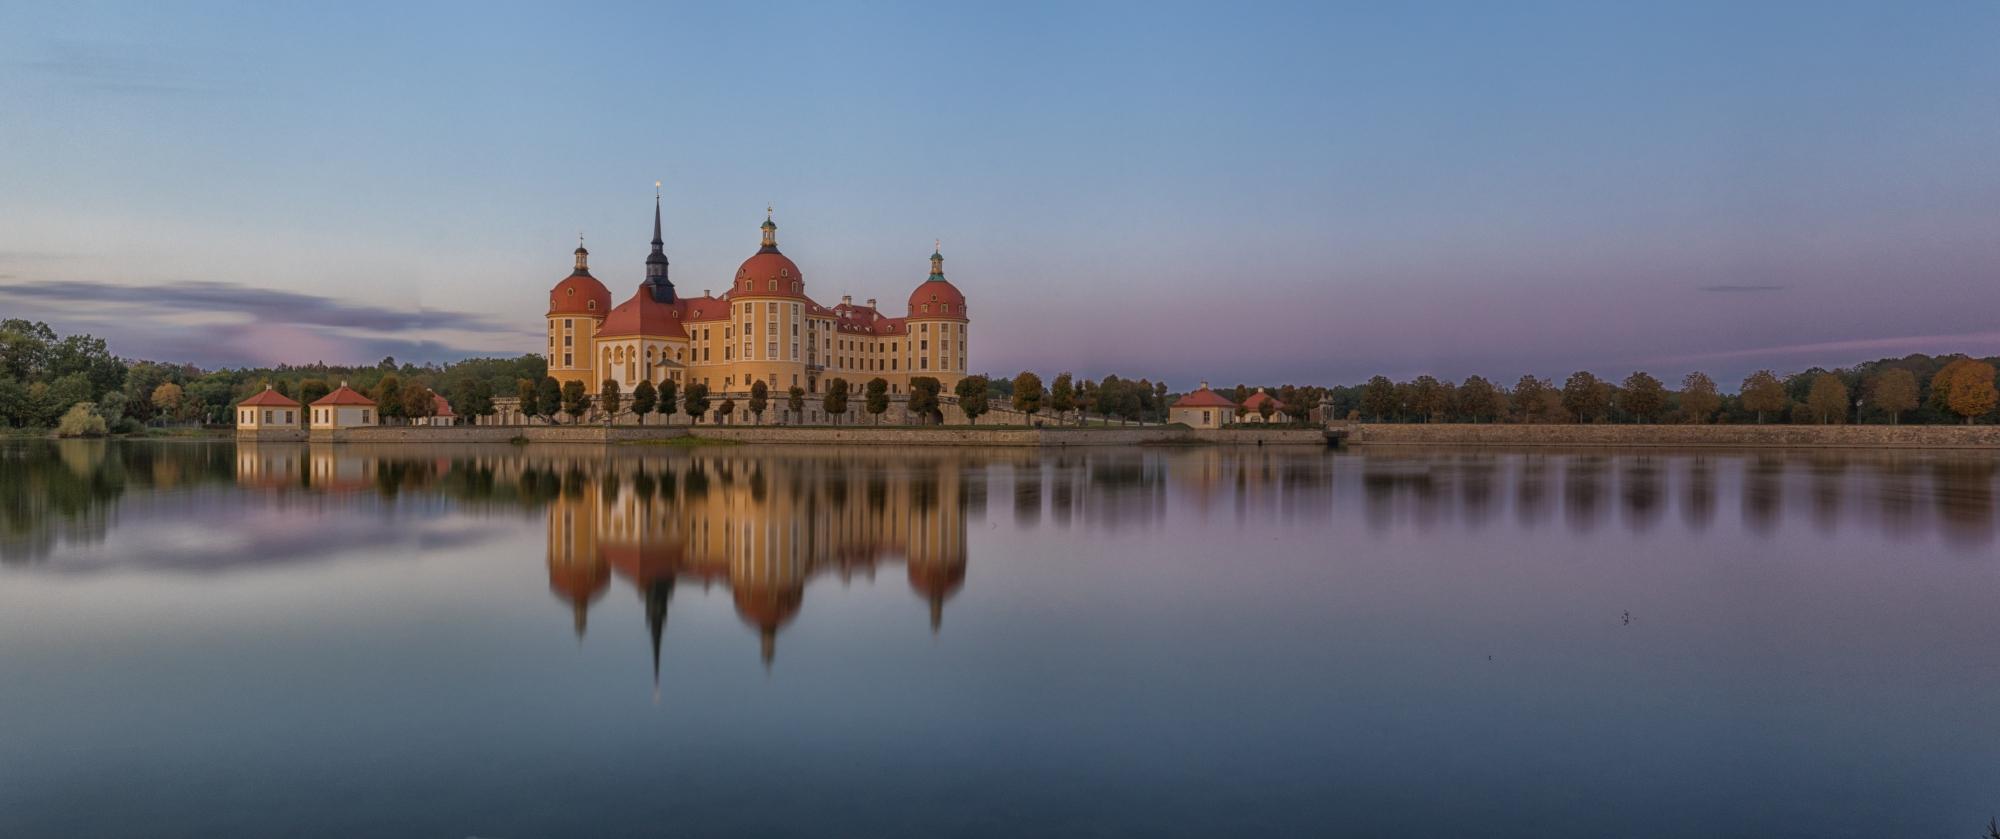 Moritzburg Castle Panorama, Germany